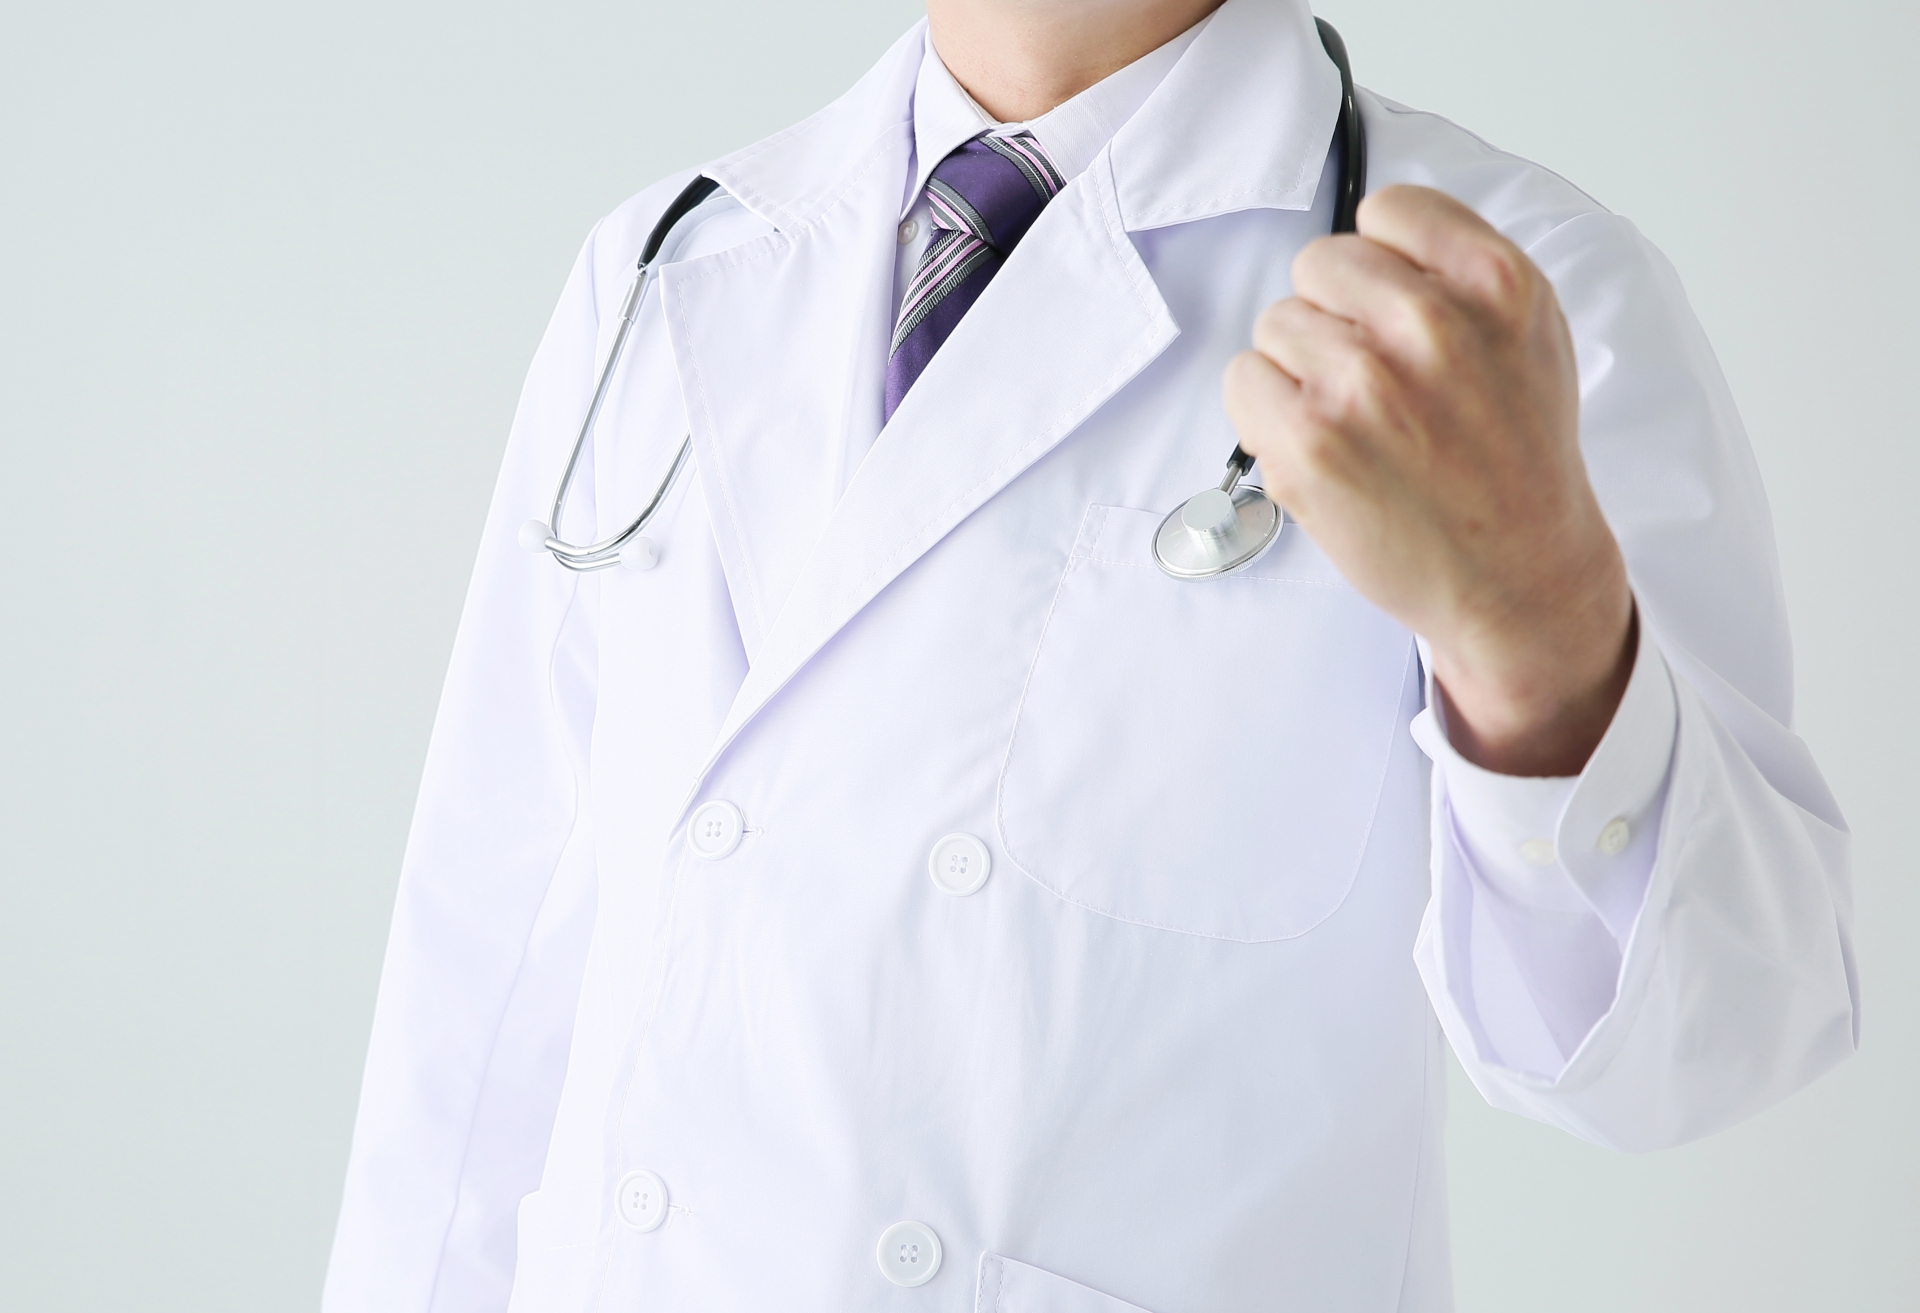 3d6a570b0203bf1a5d989a8dcf4f2741 m 「発毛の腸内革命」を提唱した藤田医学博士が実践していること